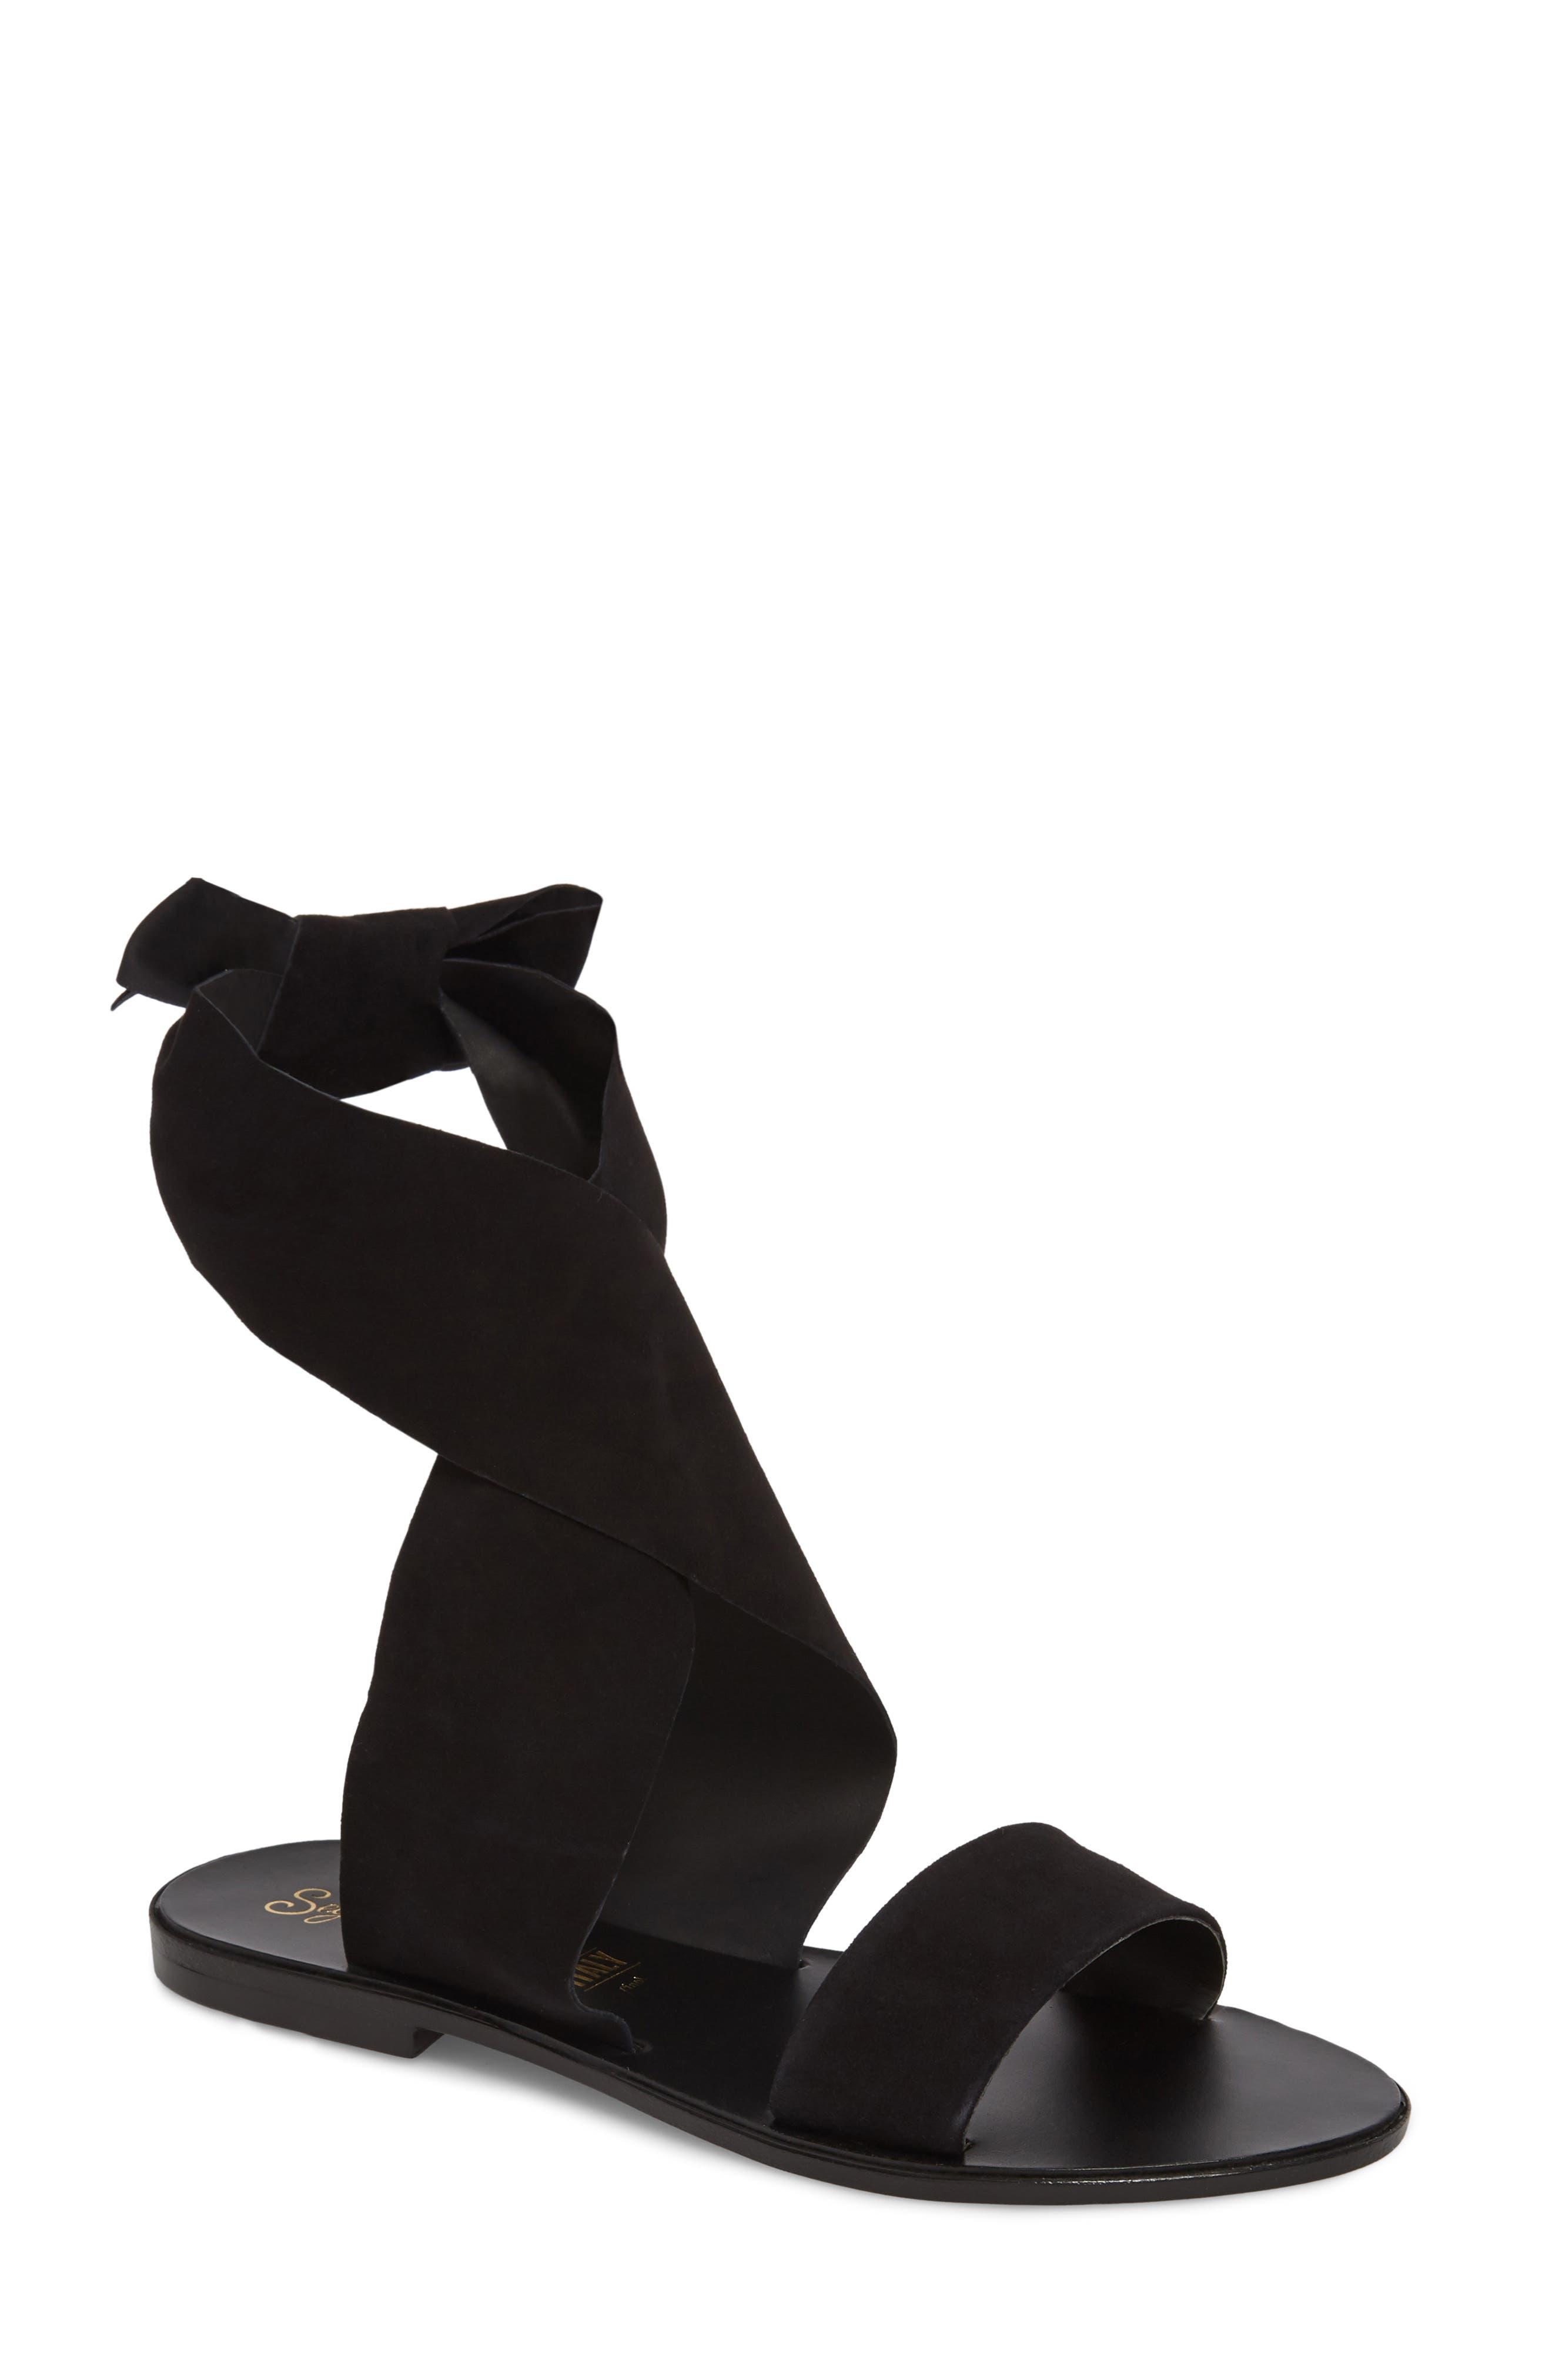 Cruisin Ankle Wrap Sandal,                         Main,                         color, 001